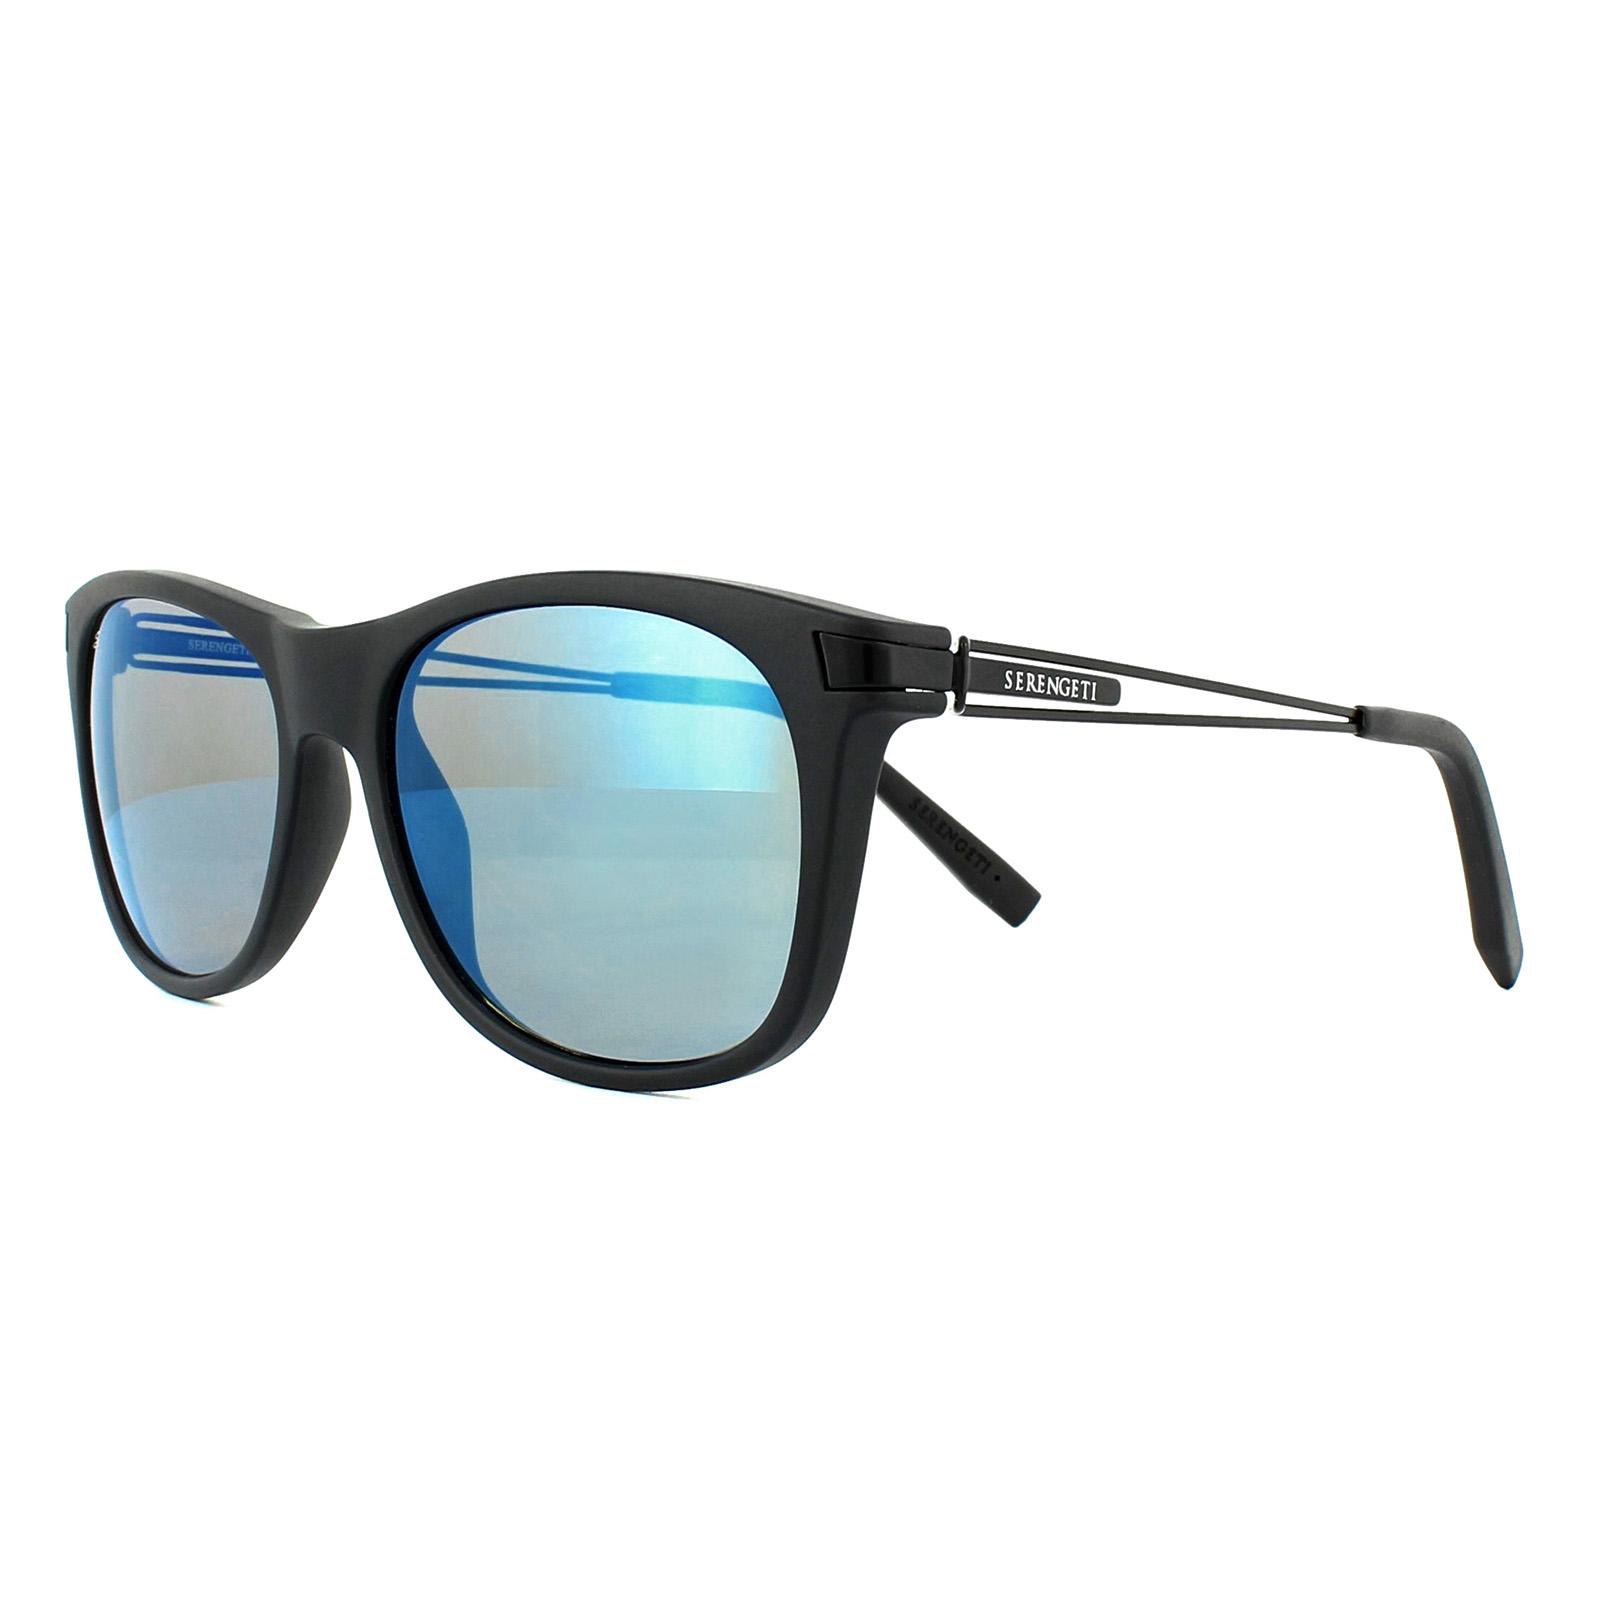 5affd173ae Sentinel Serengeti Sunglasses Pavia 8203 Satin Black 555nm Blue Mirror  Polarized